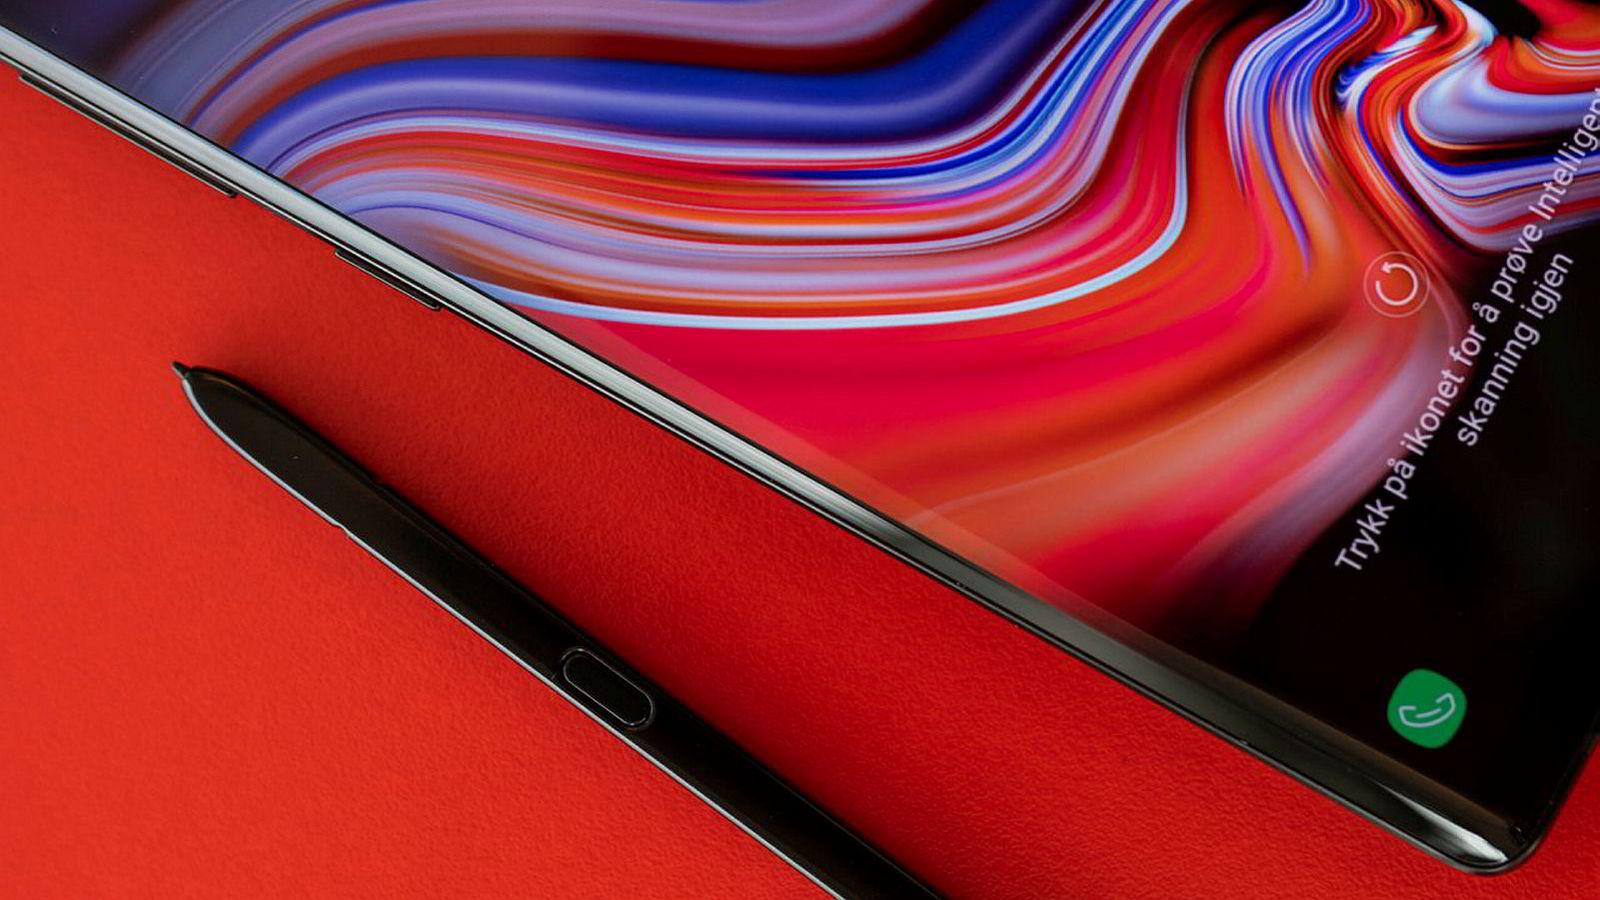 Samsung Galaxy Note9 er imponerende på mange måter. Men man må være i målgruppen for at den skal være det riktige valget.